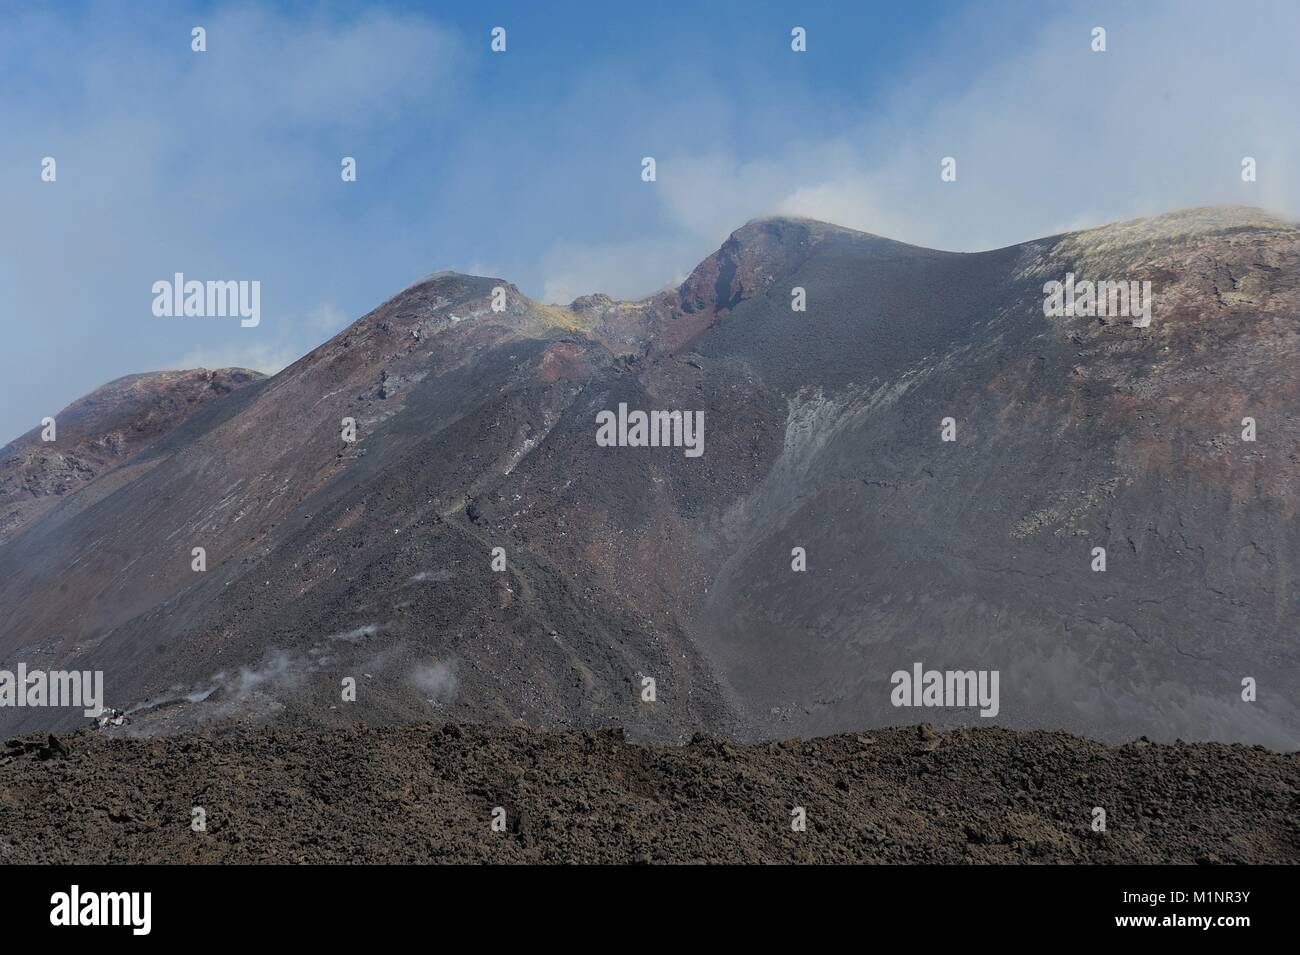 Italy, Sicily, Mount Etna Volcano, lava fields - October 2017   usage worldwide - Stock Image